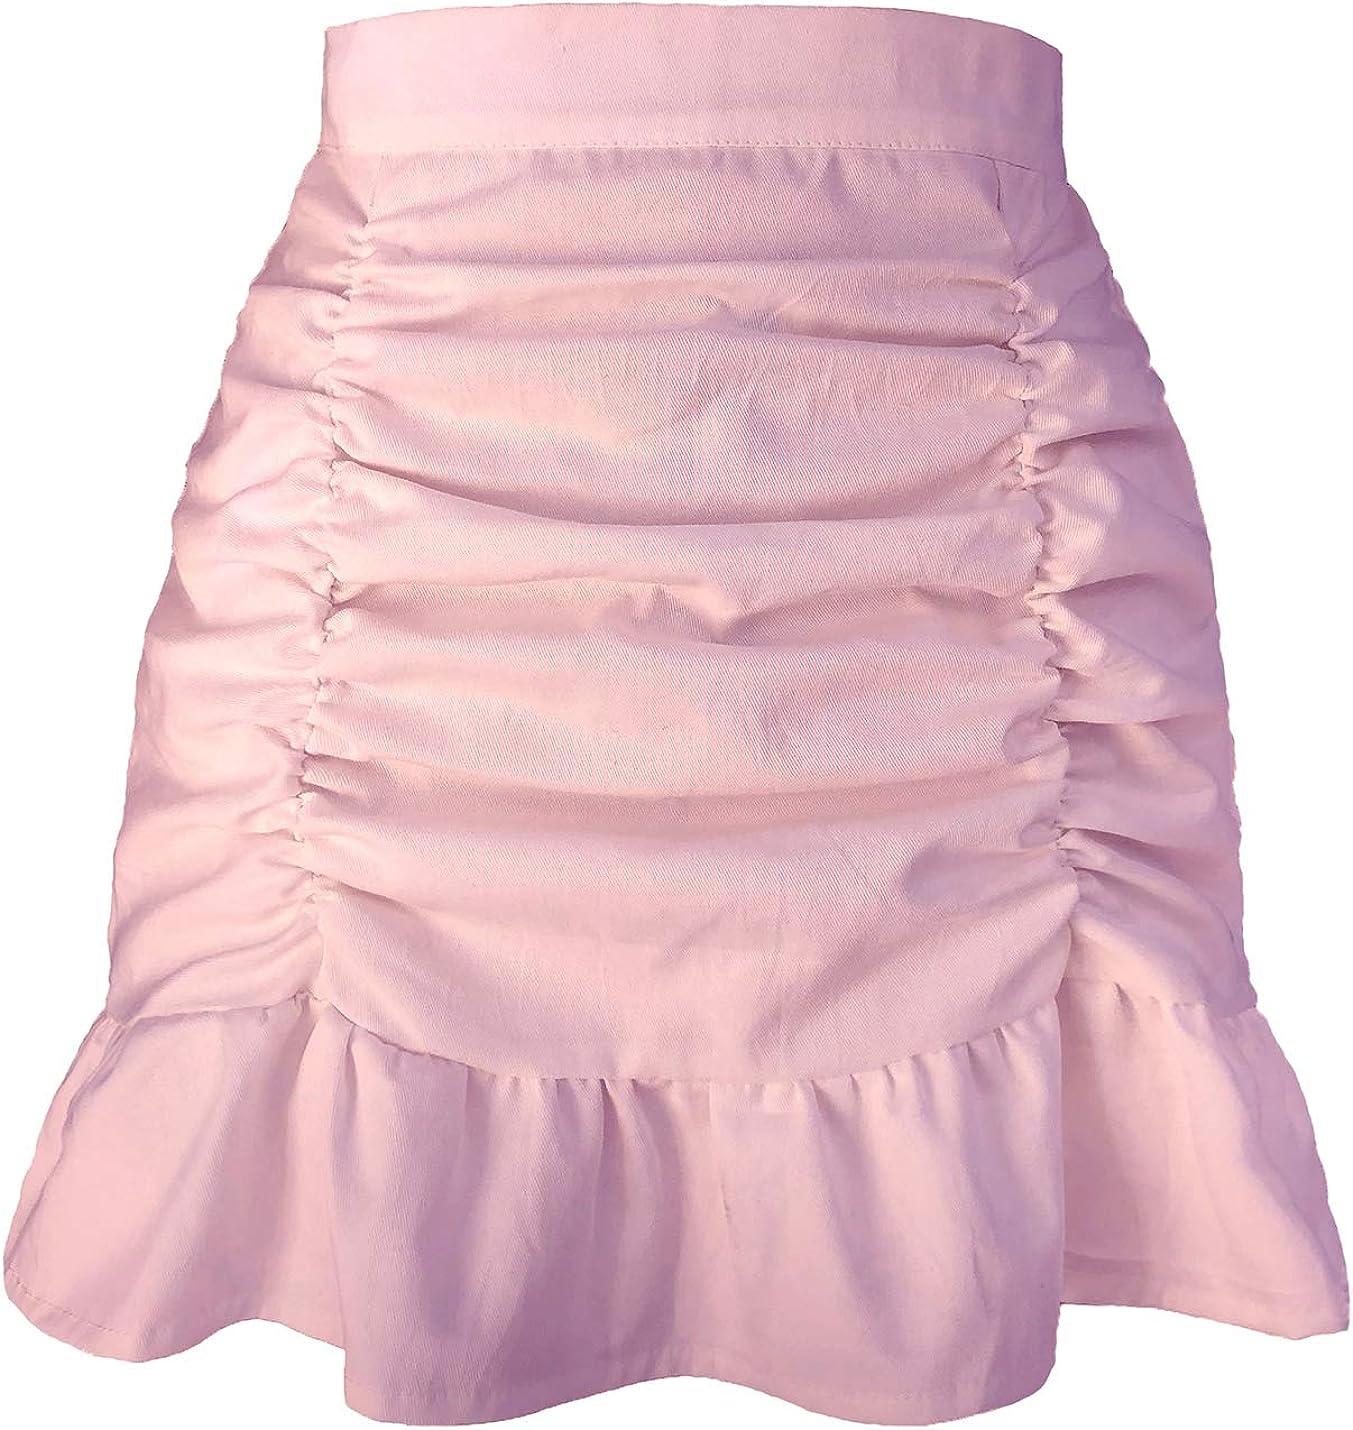 IKIIO Women's Casual Summer Solid High Waist Ruffle Hem Pleated Skirt Flared A Line Skirts